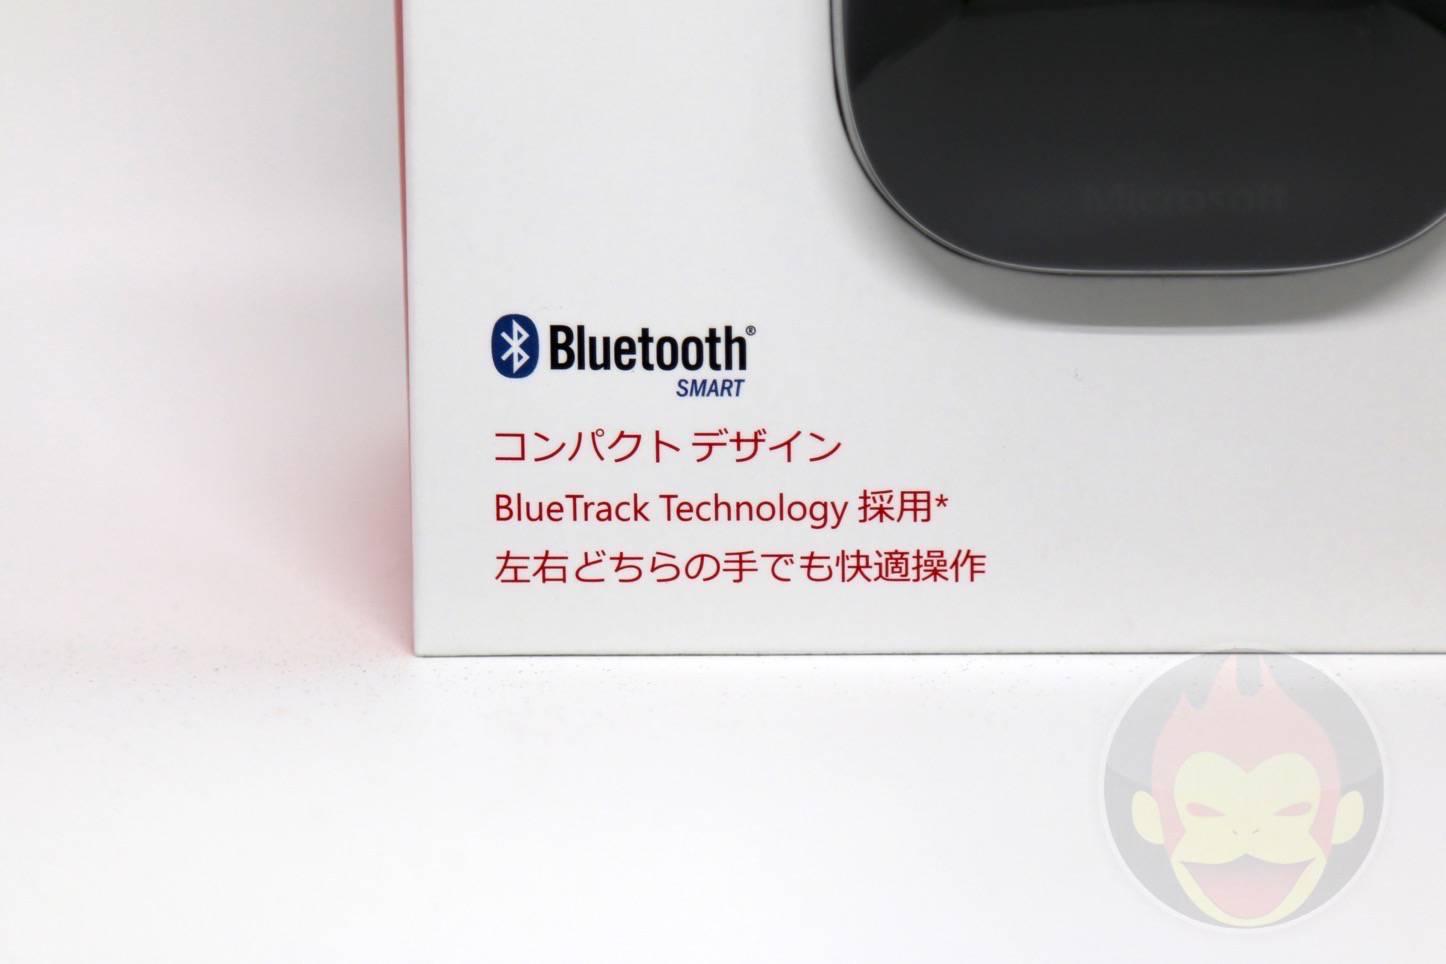 Microsoft-Designer-Bluetooth-Mouse-01.jpg